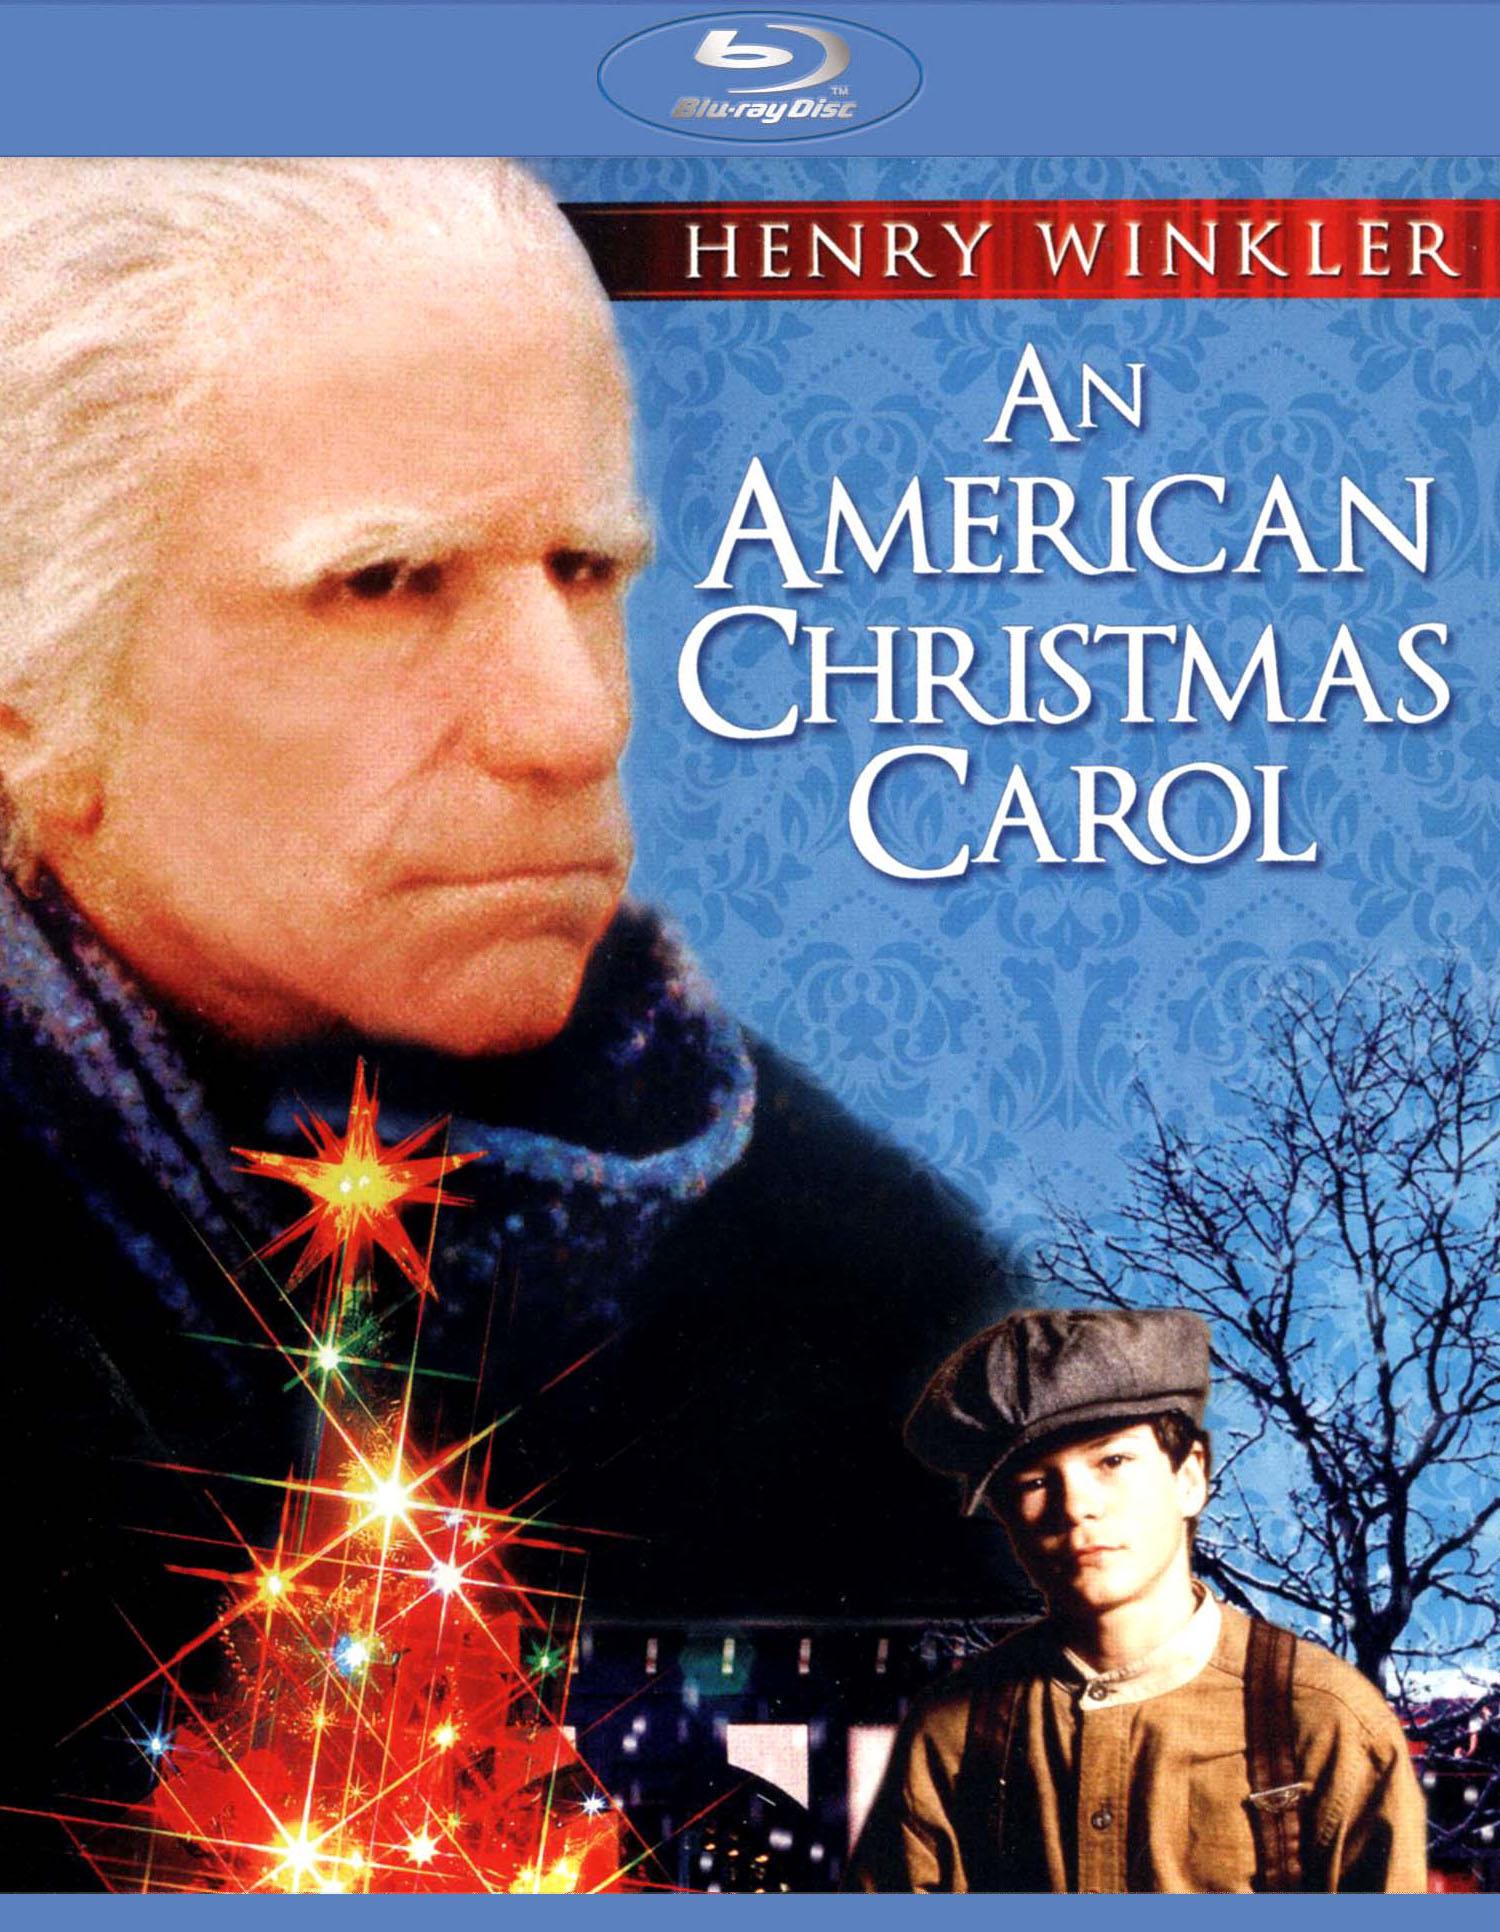 An American Christmas Carol [blu-ray] 20470554